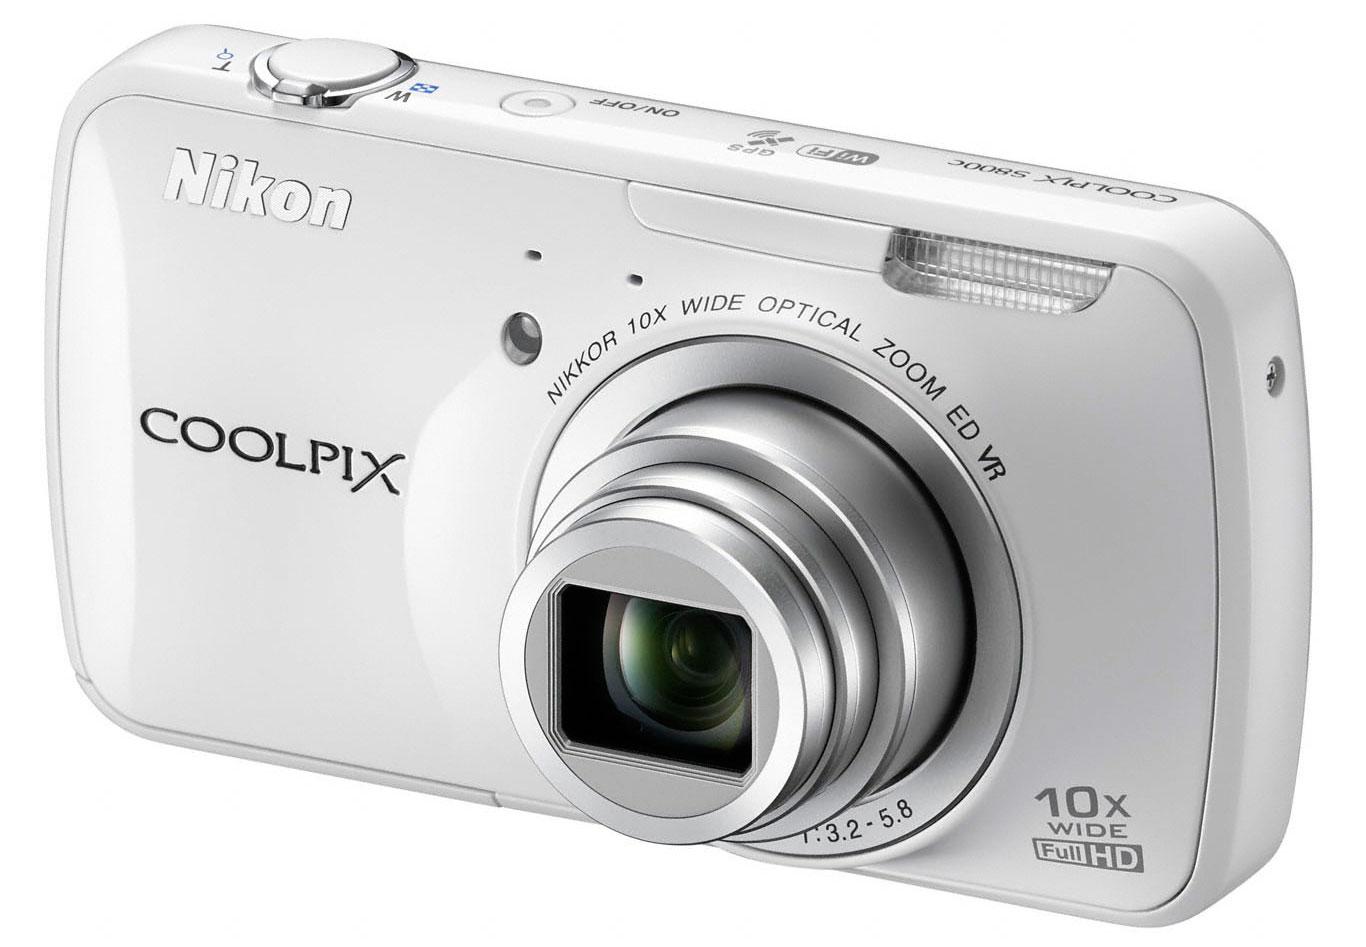 Smarrita macchina fotografica Nikon